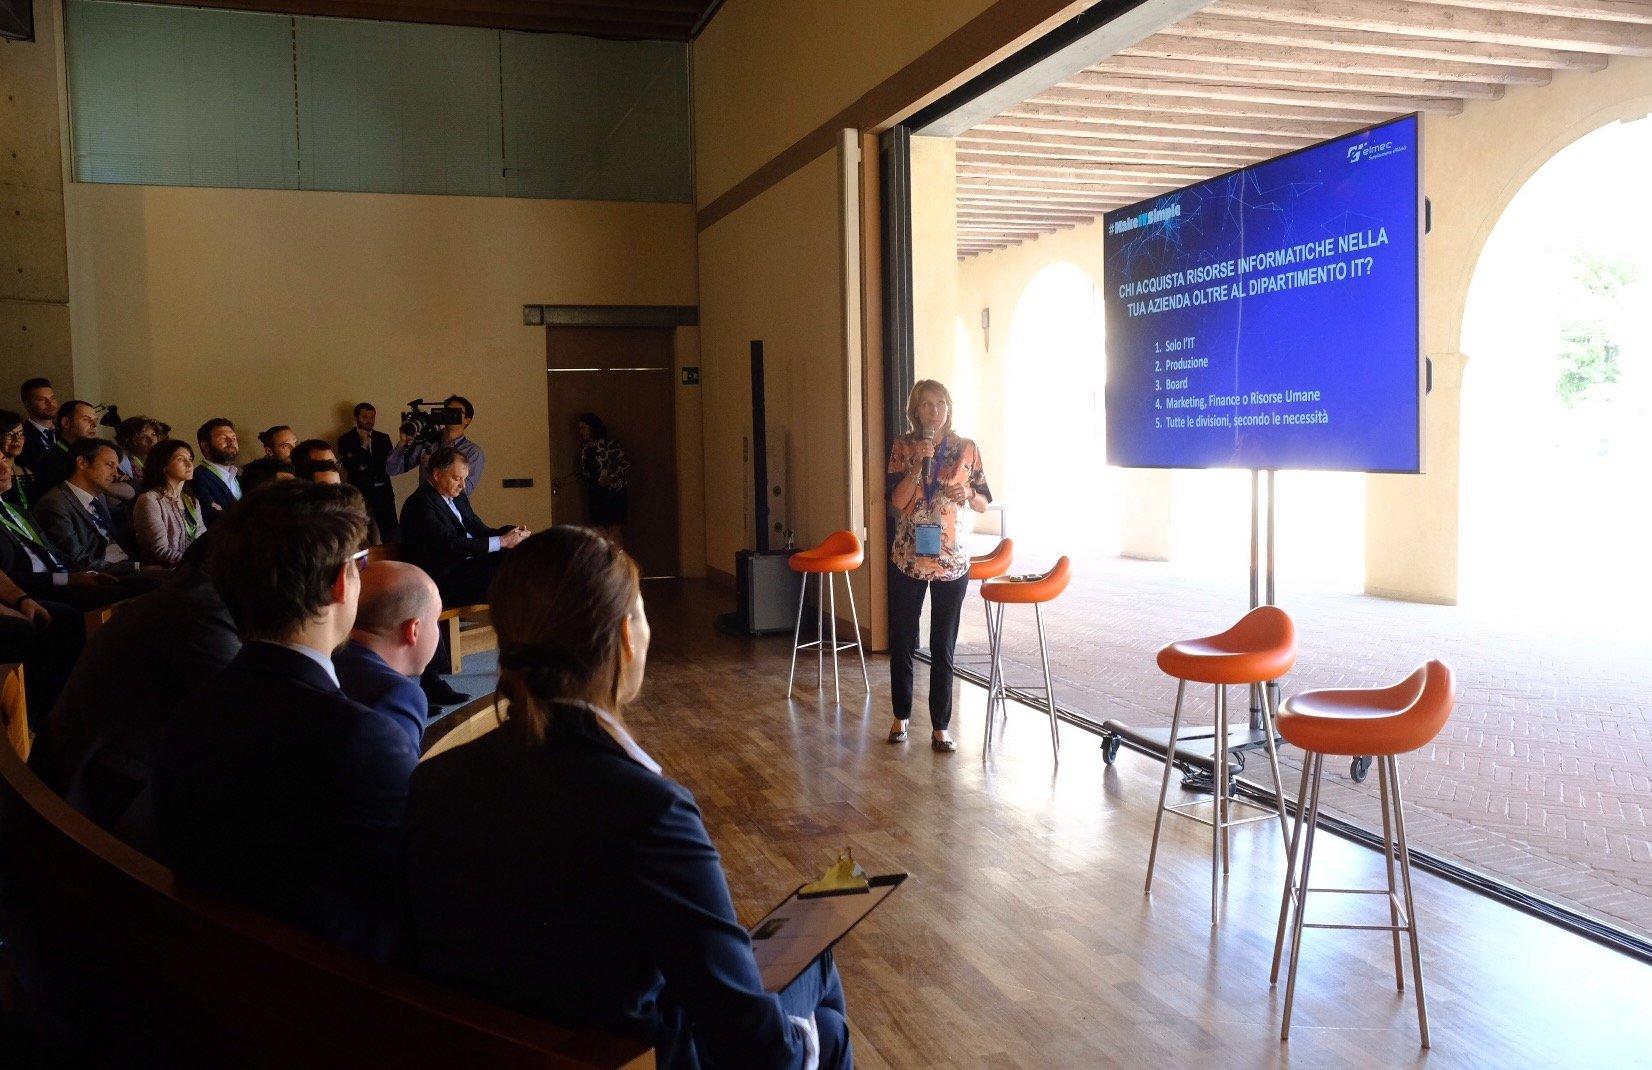 Digital Transformation - Cora Scandroglio introduce il panel